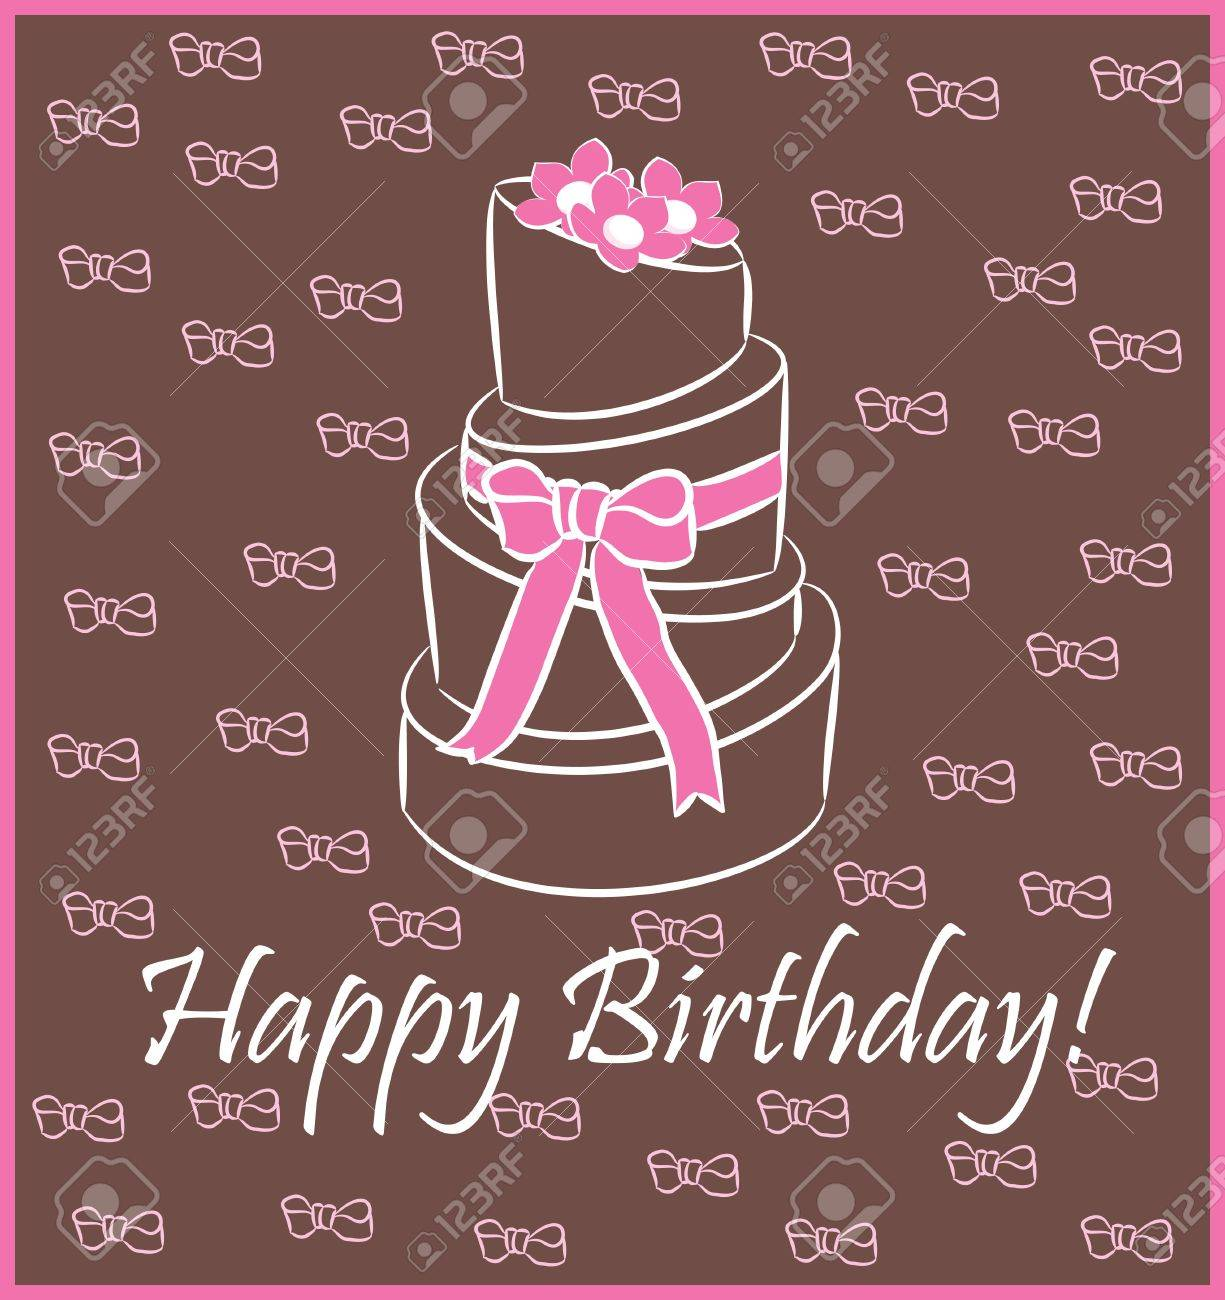 birthday cake   Greeting Card Stock Vector - 13282281